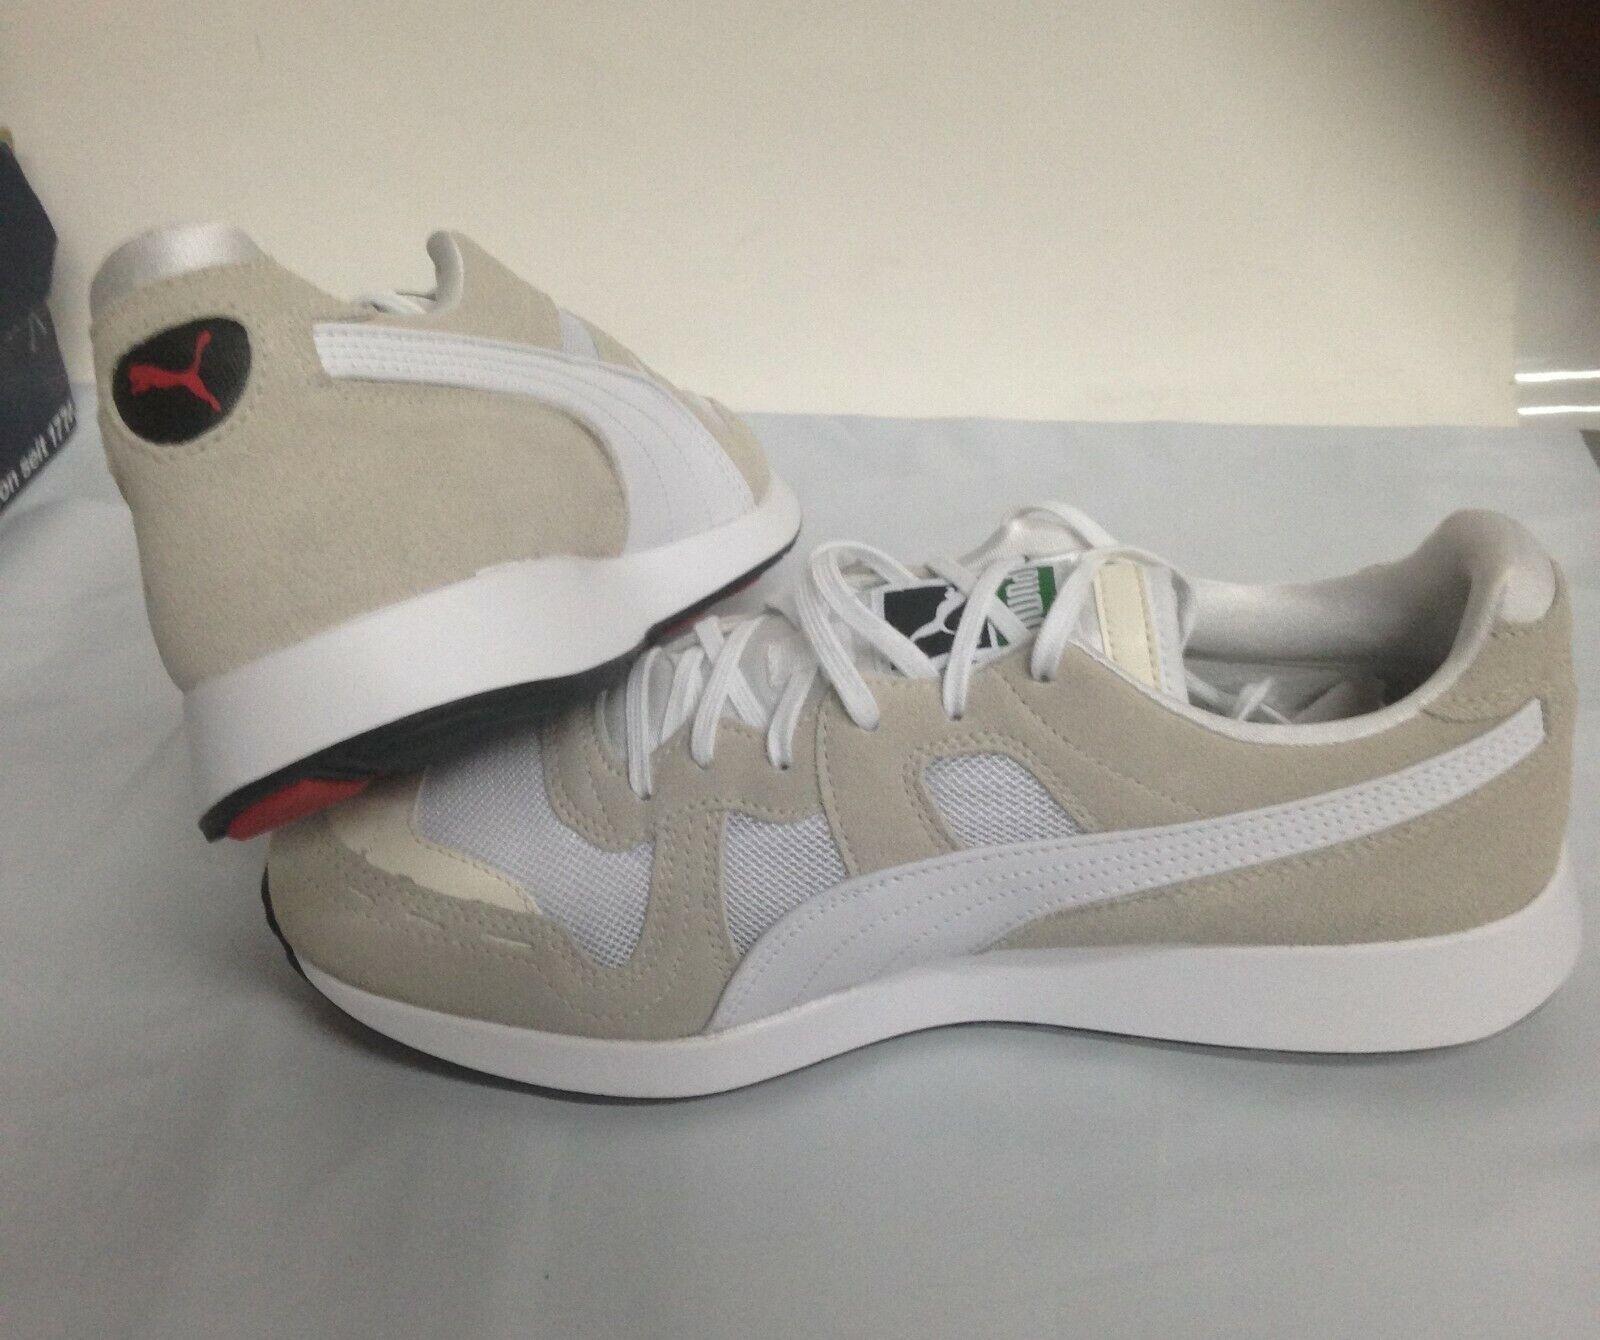 NIB Men's PUMA size 9 rs-100 core sneakers whisper white 369662-02